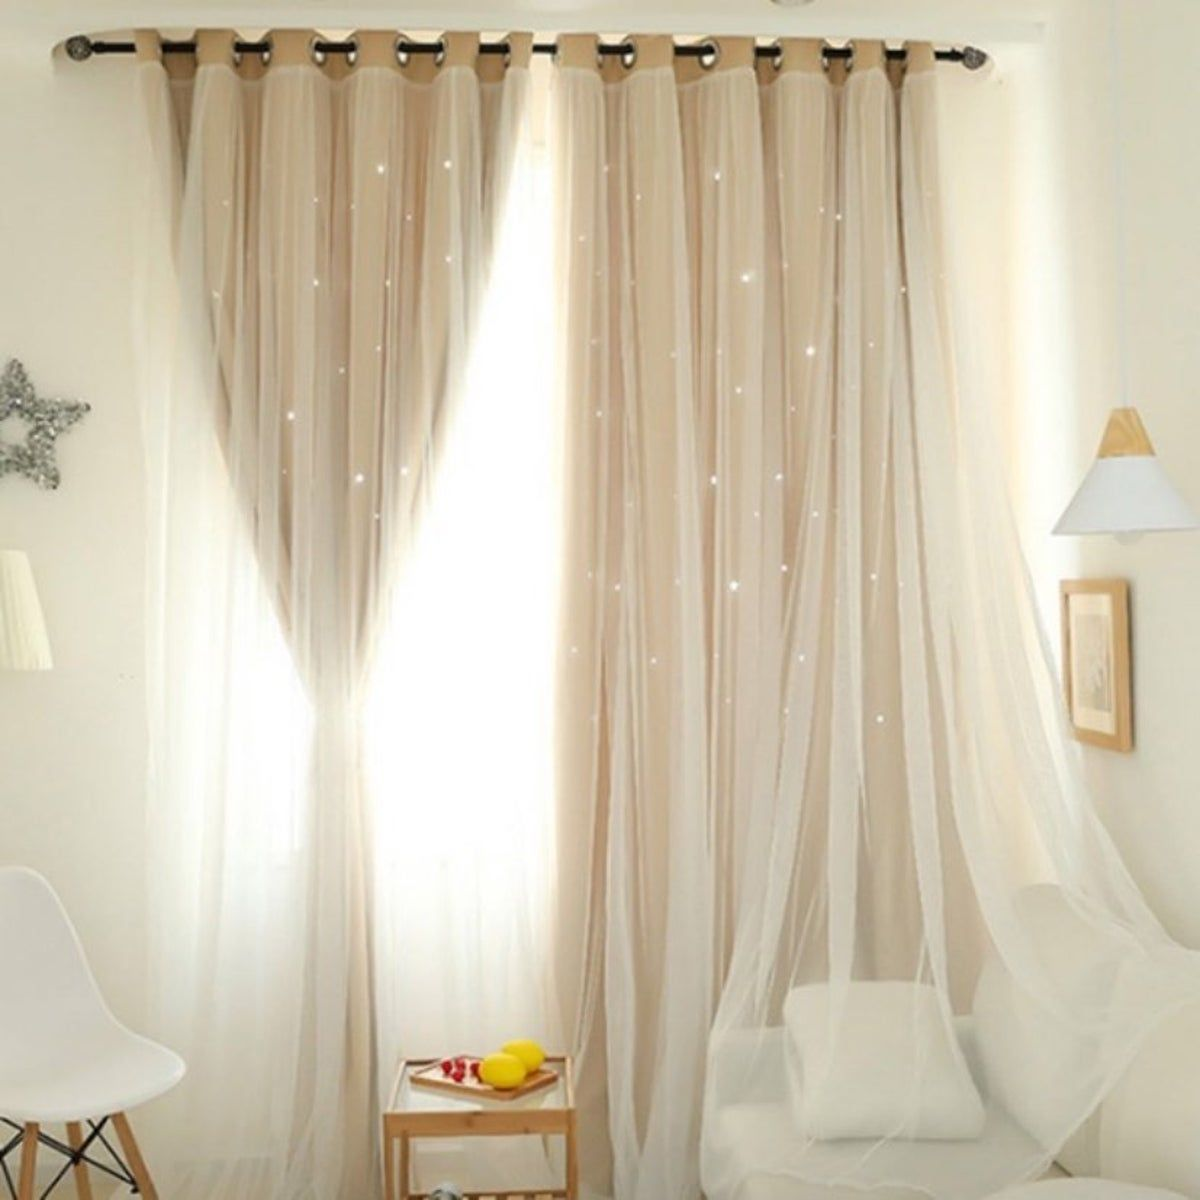 2 Pannel Ivory Star Shading Curtains On Mercari In 2020 Curtains Living Room Curtains Romantic Curtains